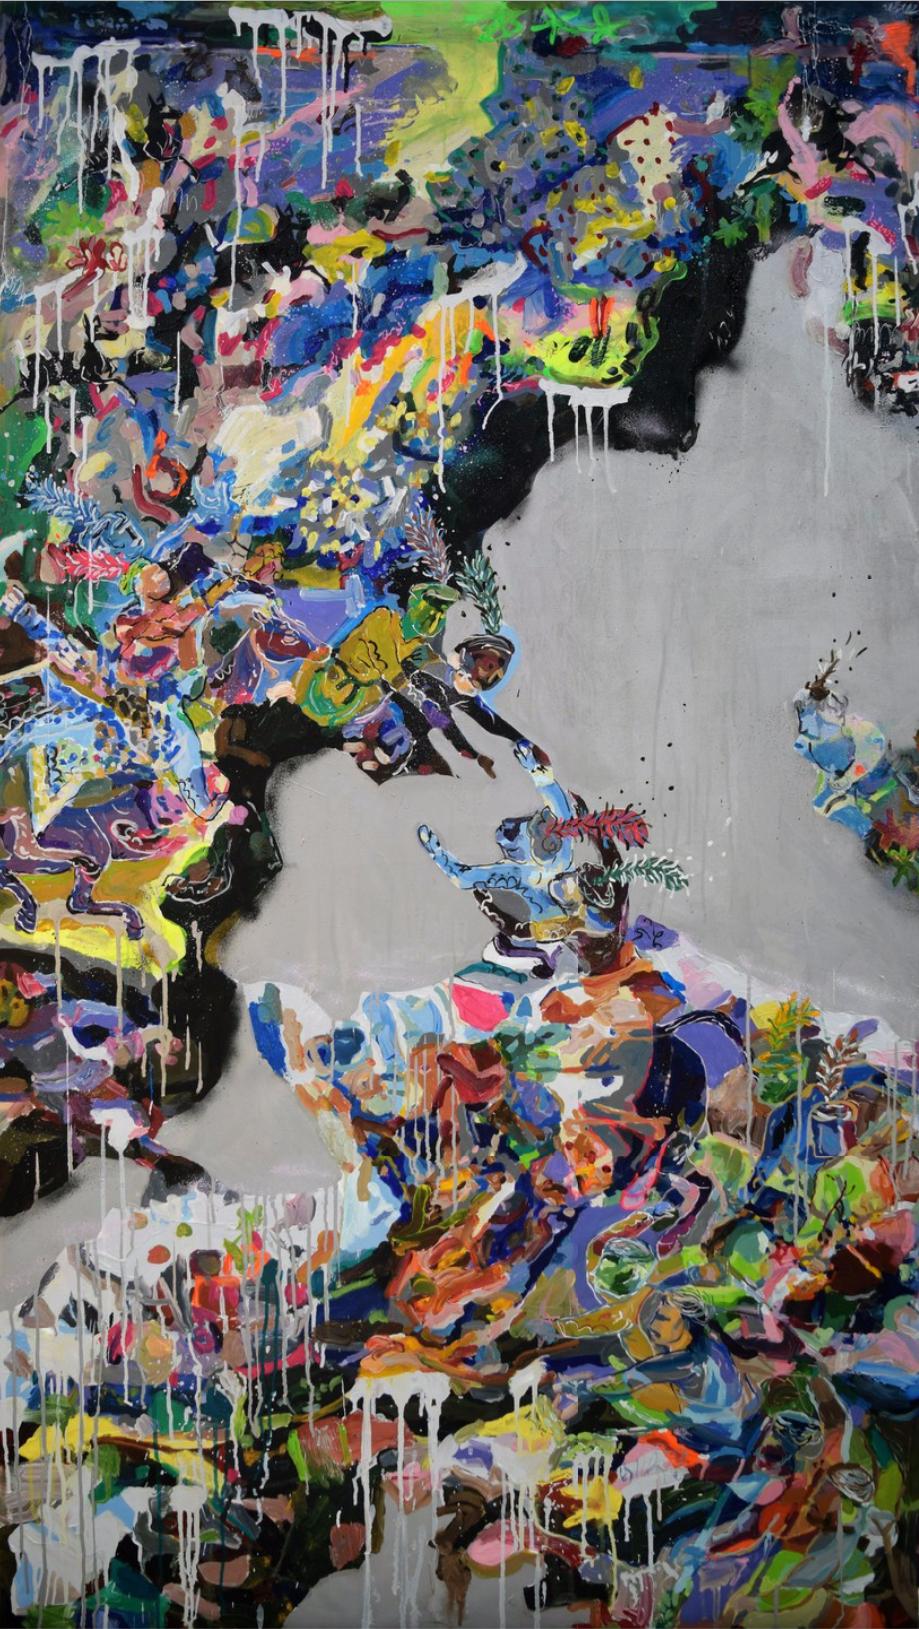 Ghalamdar, Freaks Crossin the River, acrylic, marker and spray paint on canvas, 200 x 110 cm, 2017